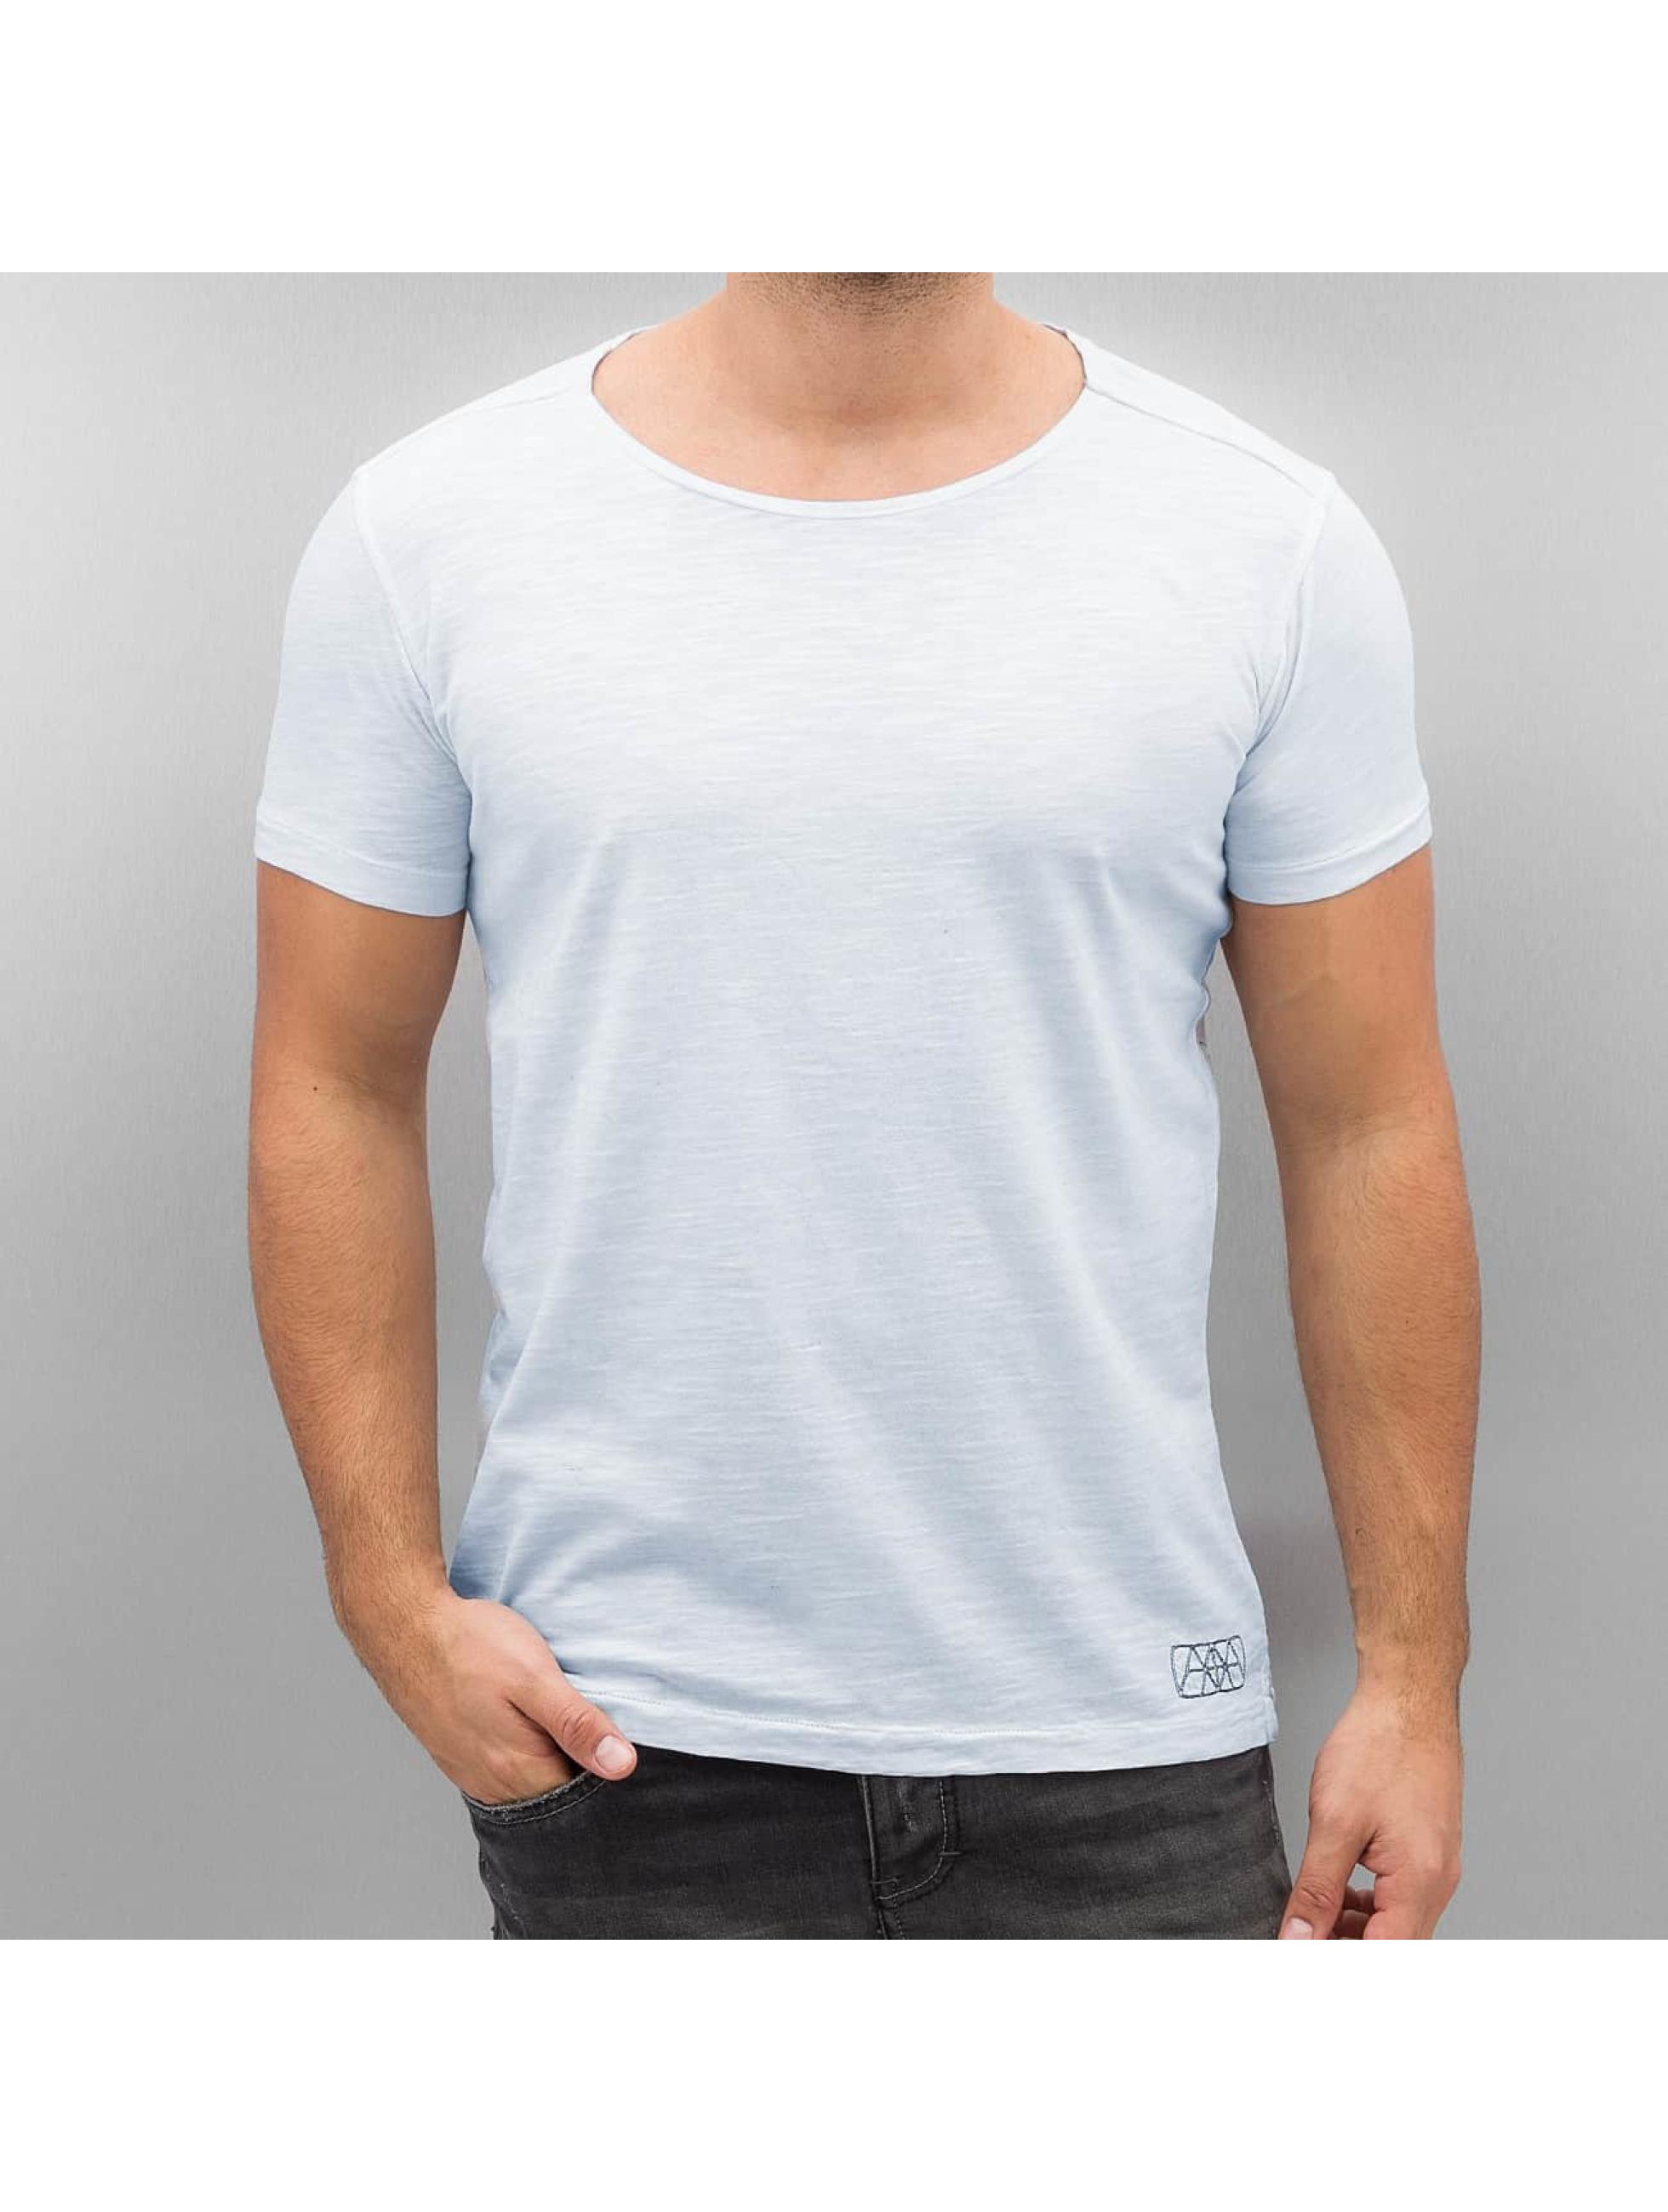 Amsterdenim Männer T-Shirt Tommy Sjaan in blau